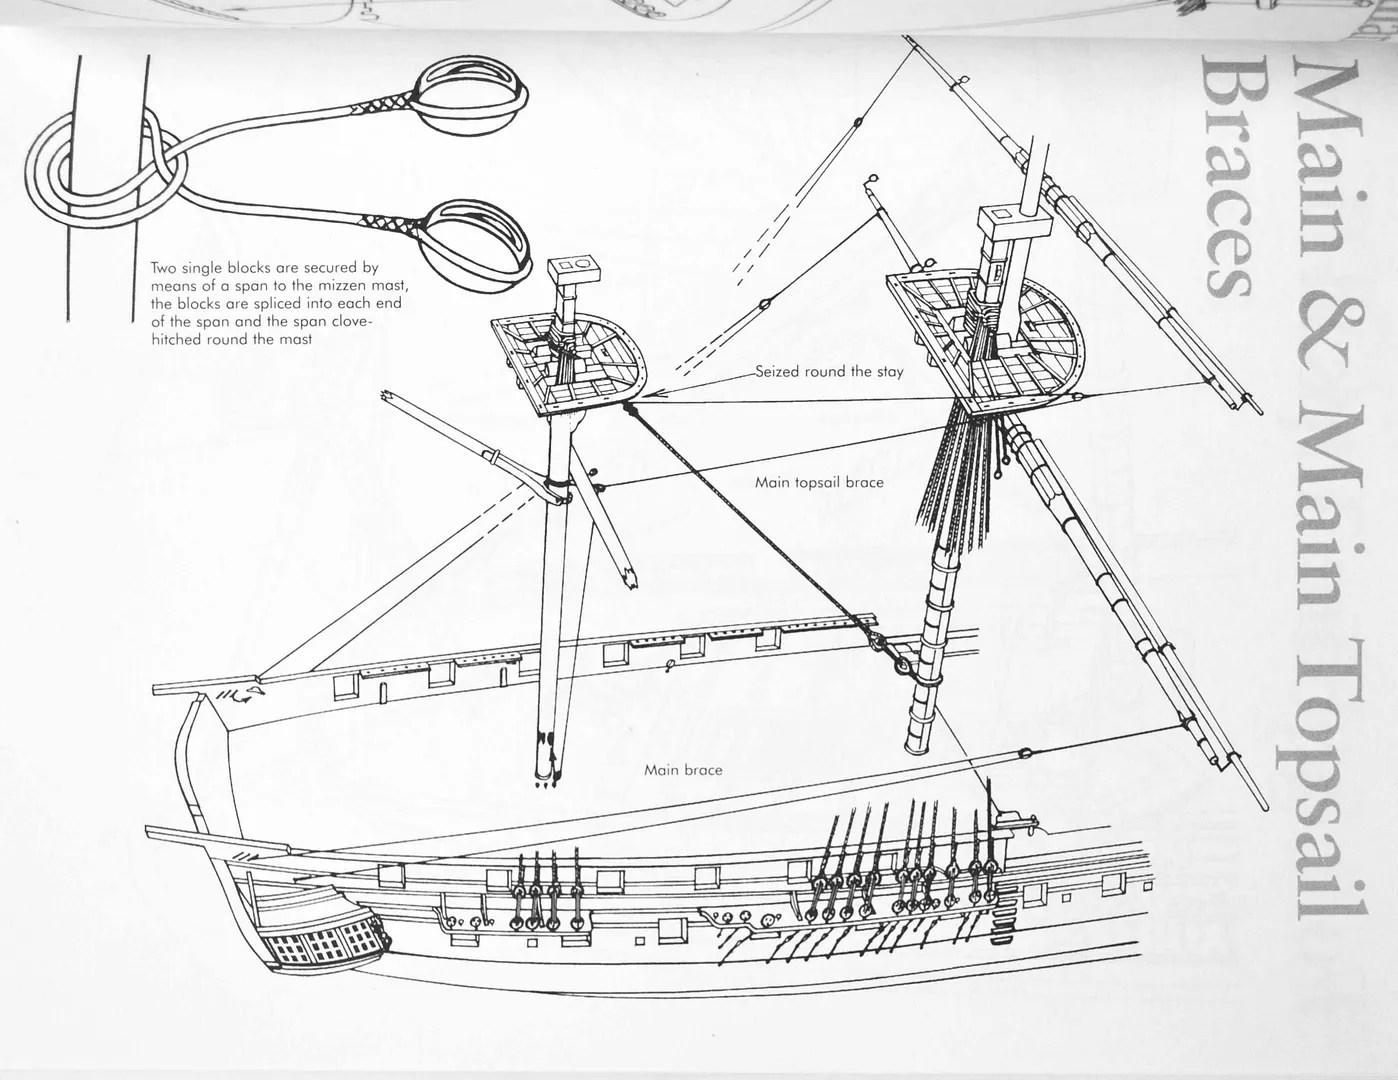 standing rigging diagram mk4 jetta tdi wiring hms scorpion cruiser class brig of war page 20 rc groups